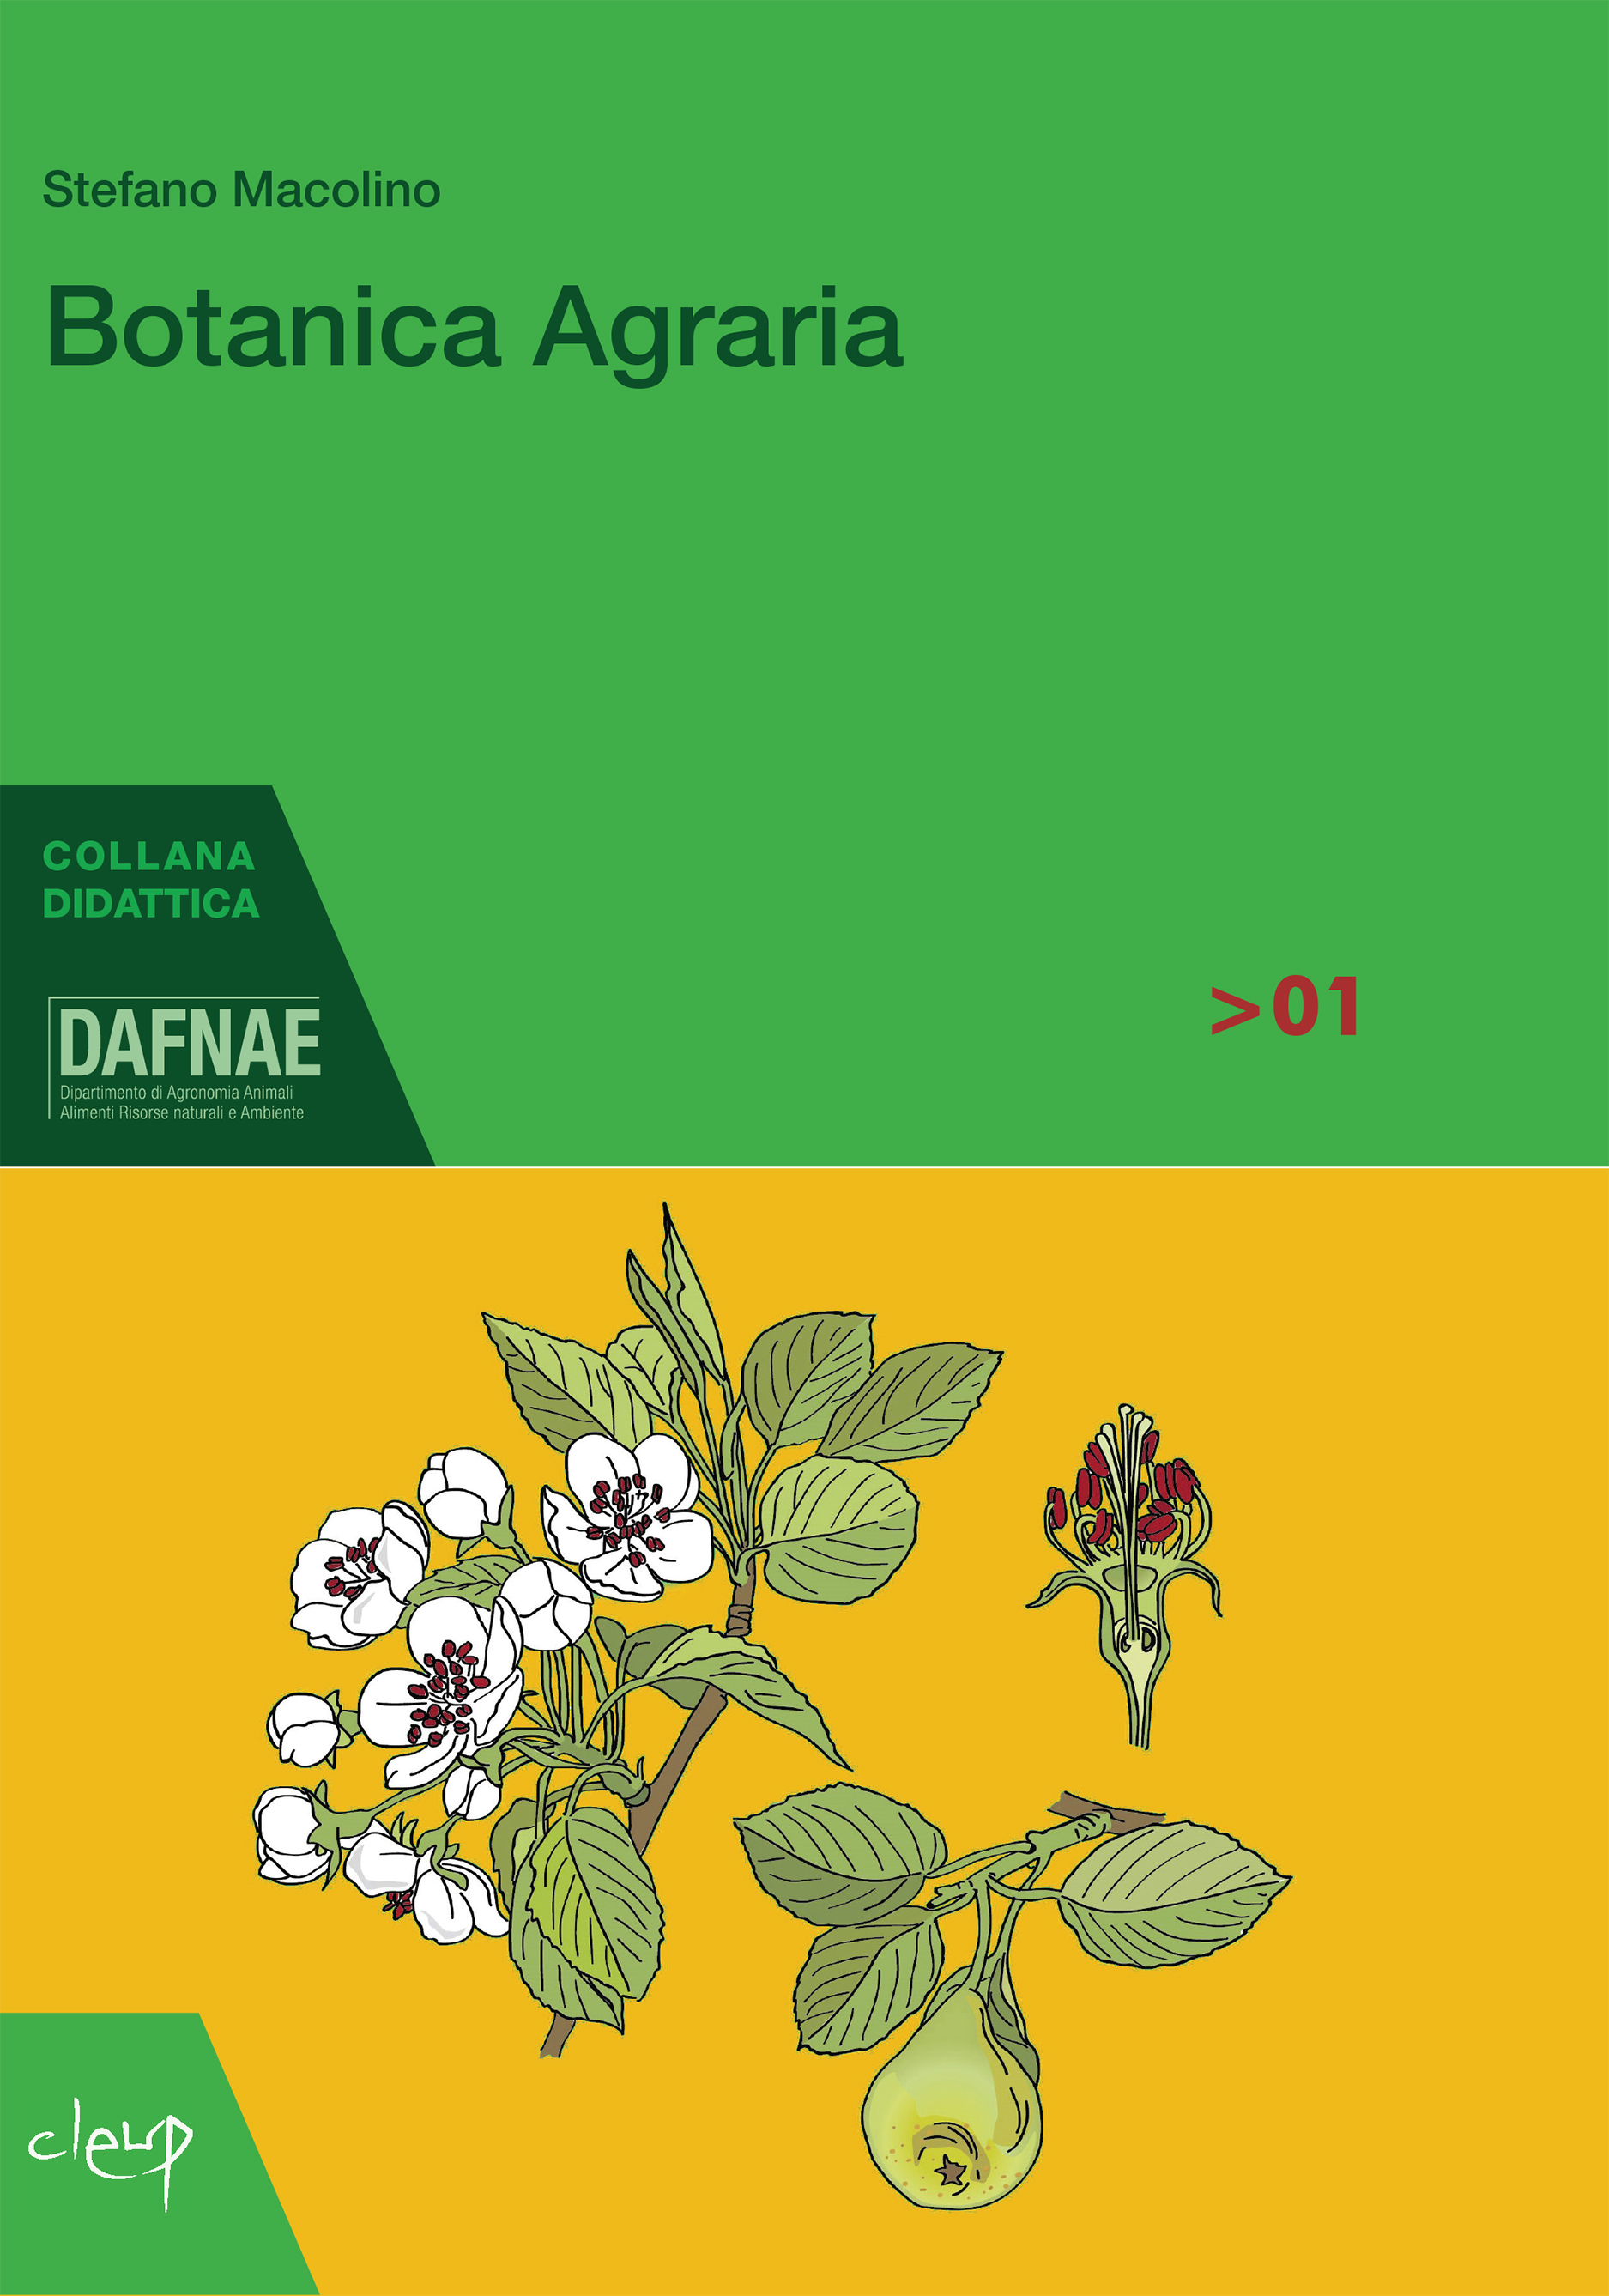 Botanica Agraria